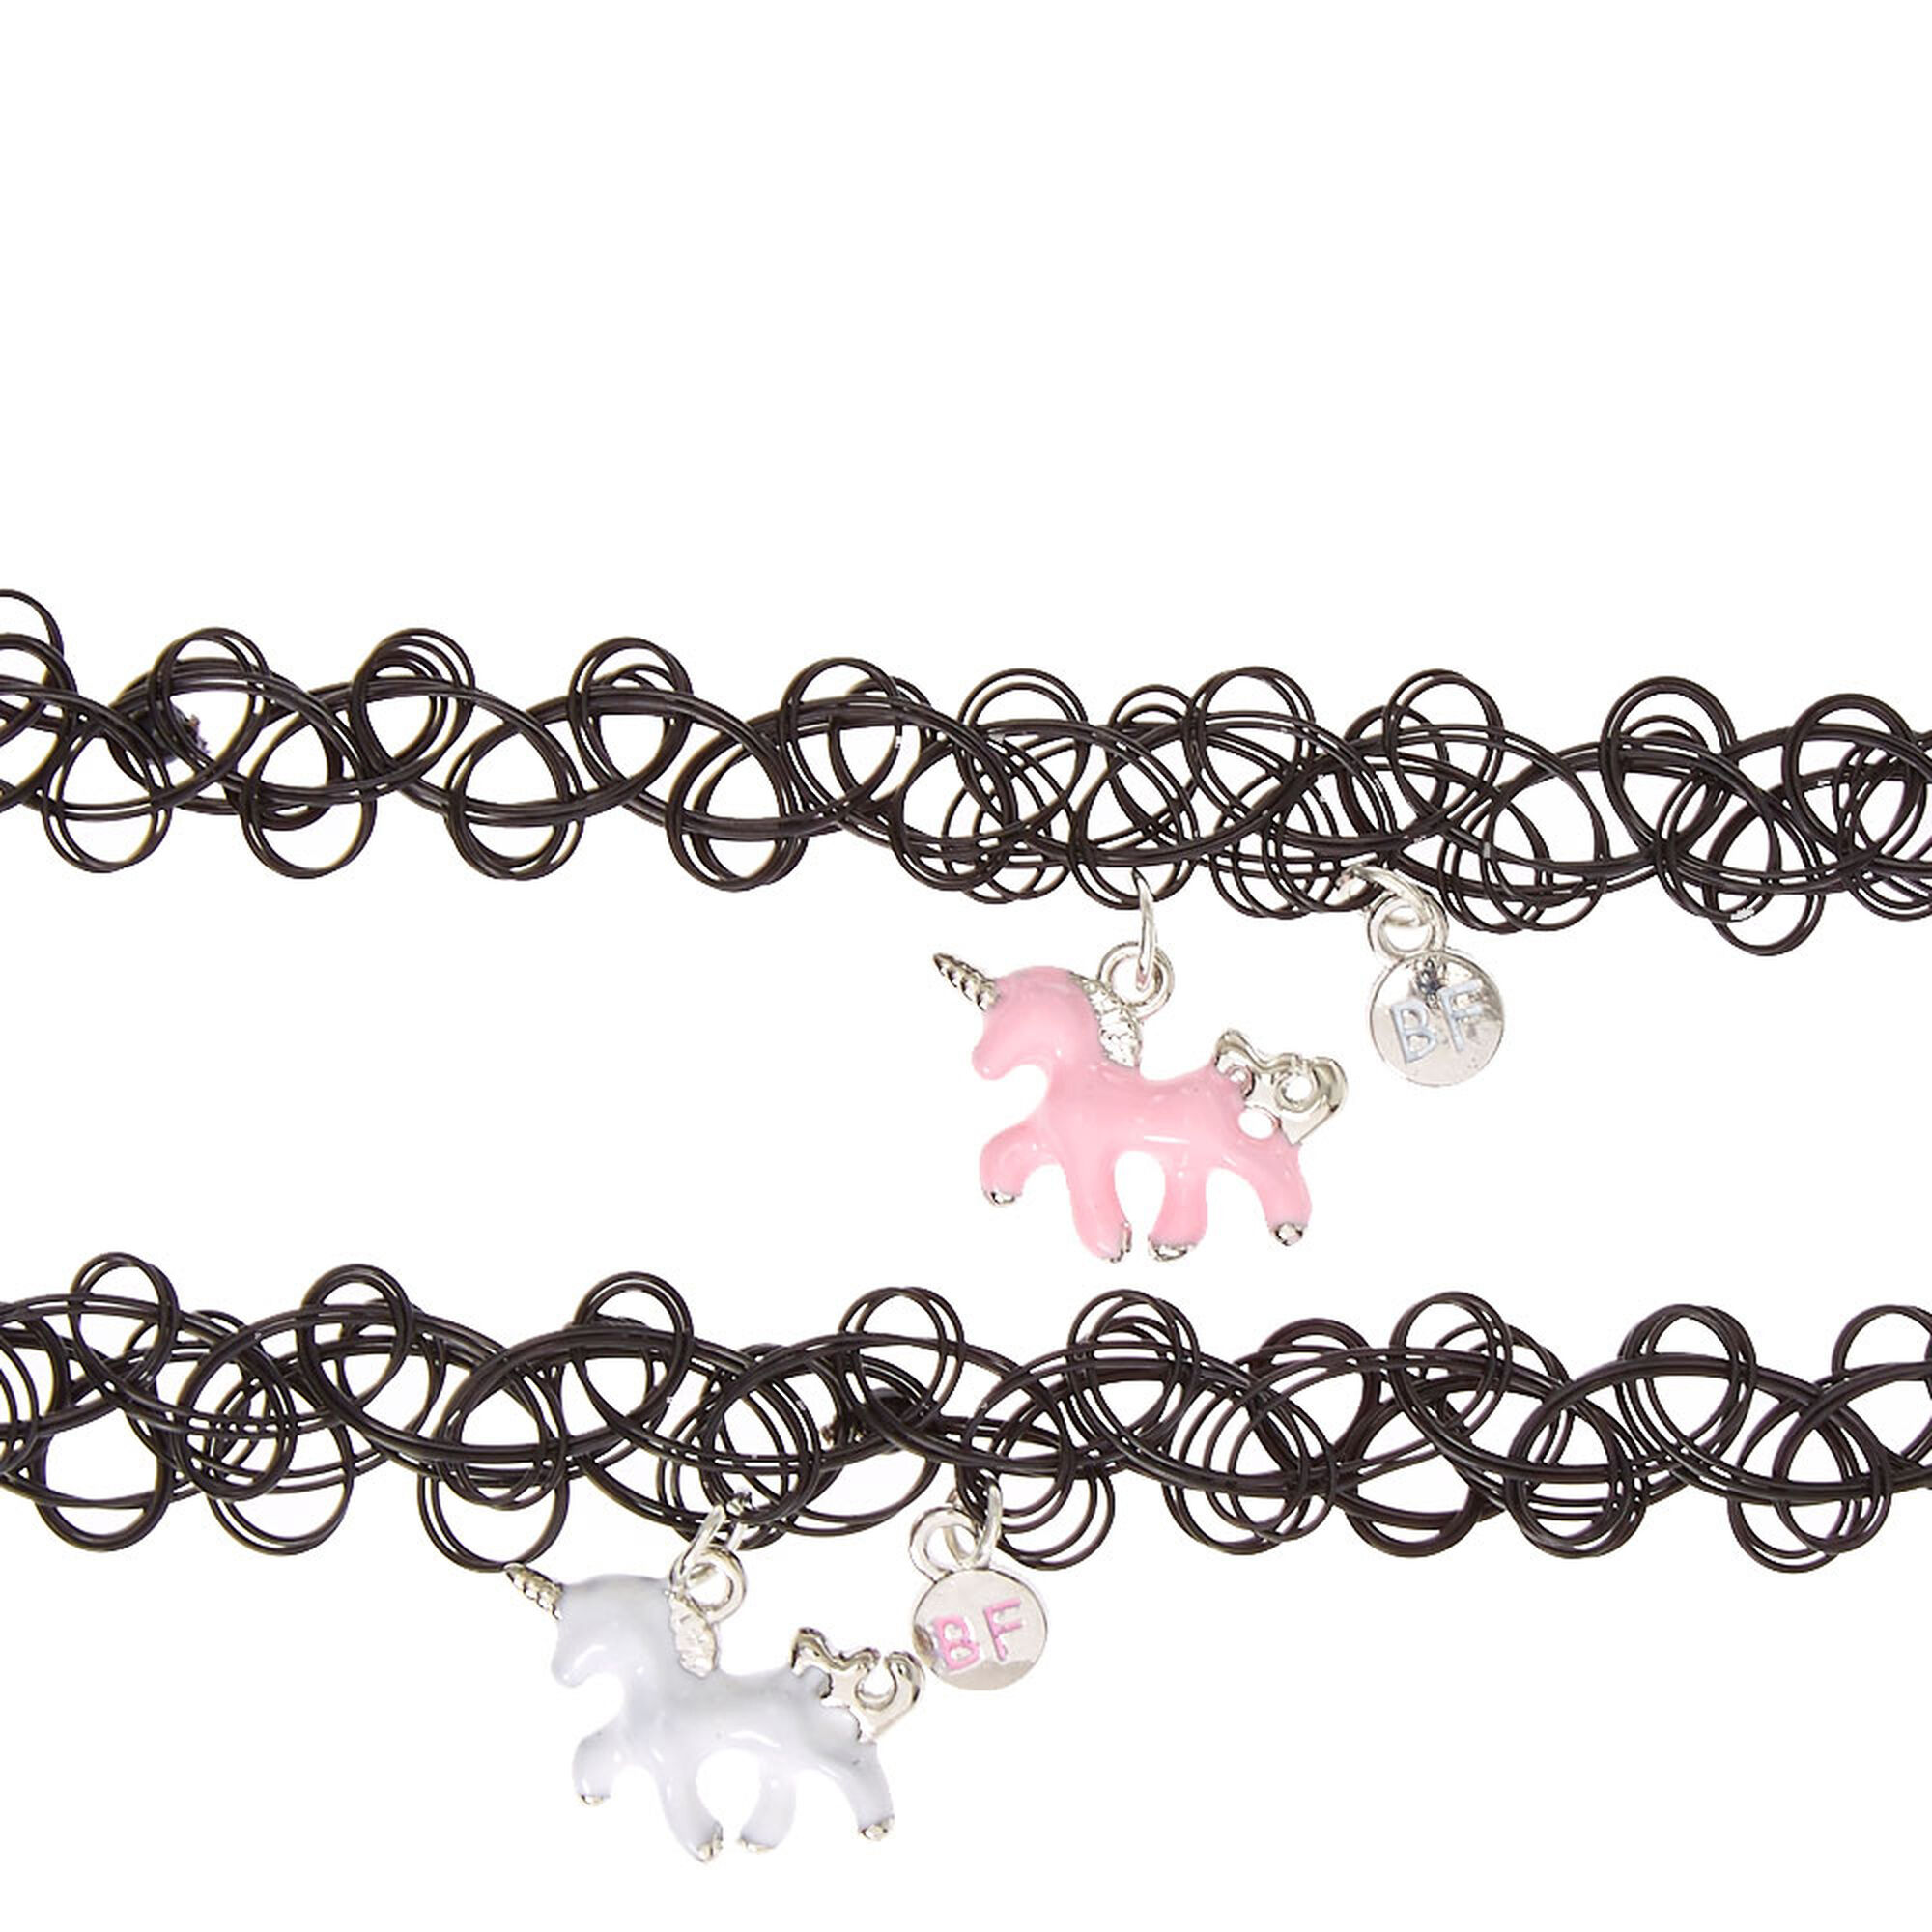 Best Friends Unicorn Pendant Black Tattoo Choker Necklaces Claire s CA